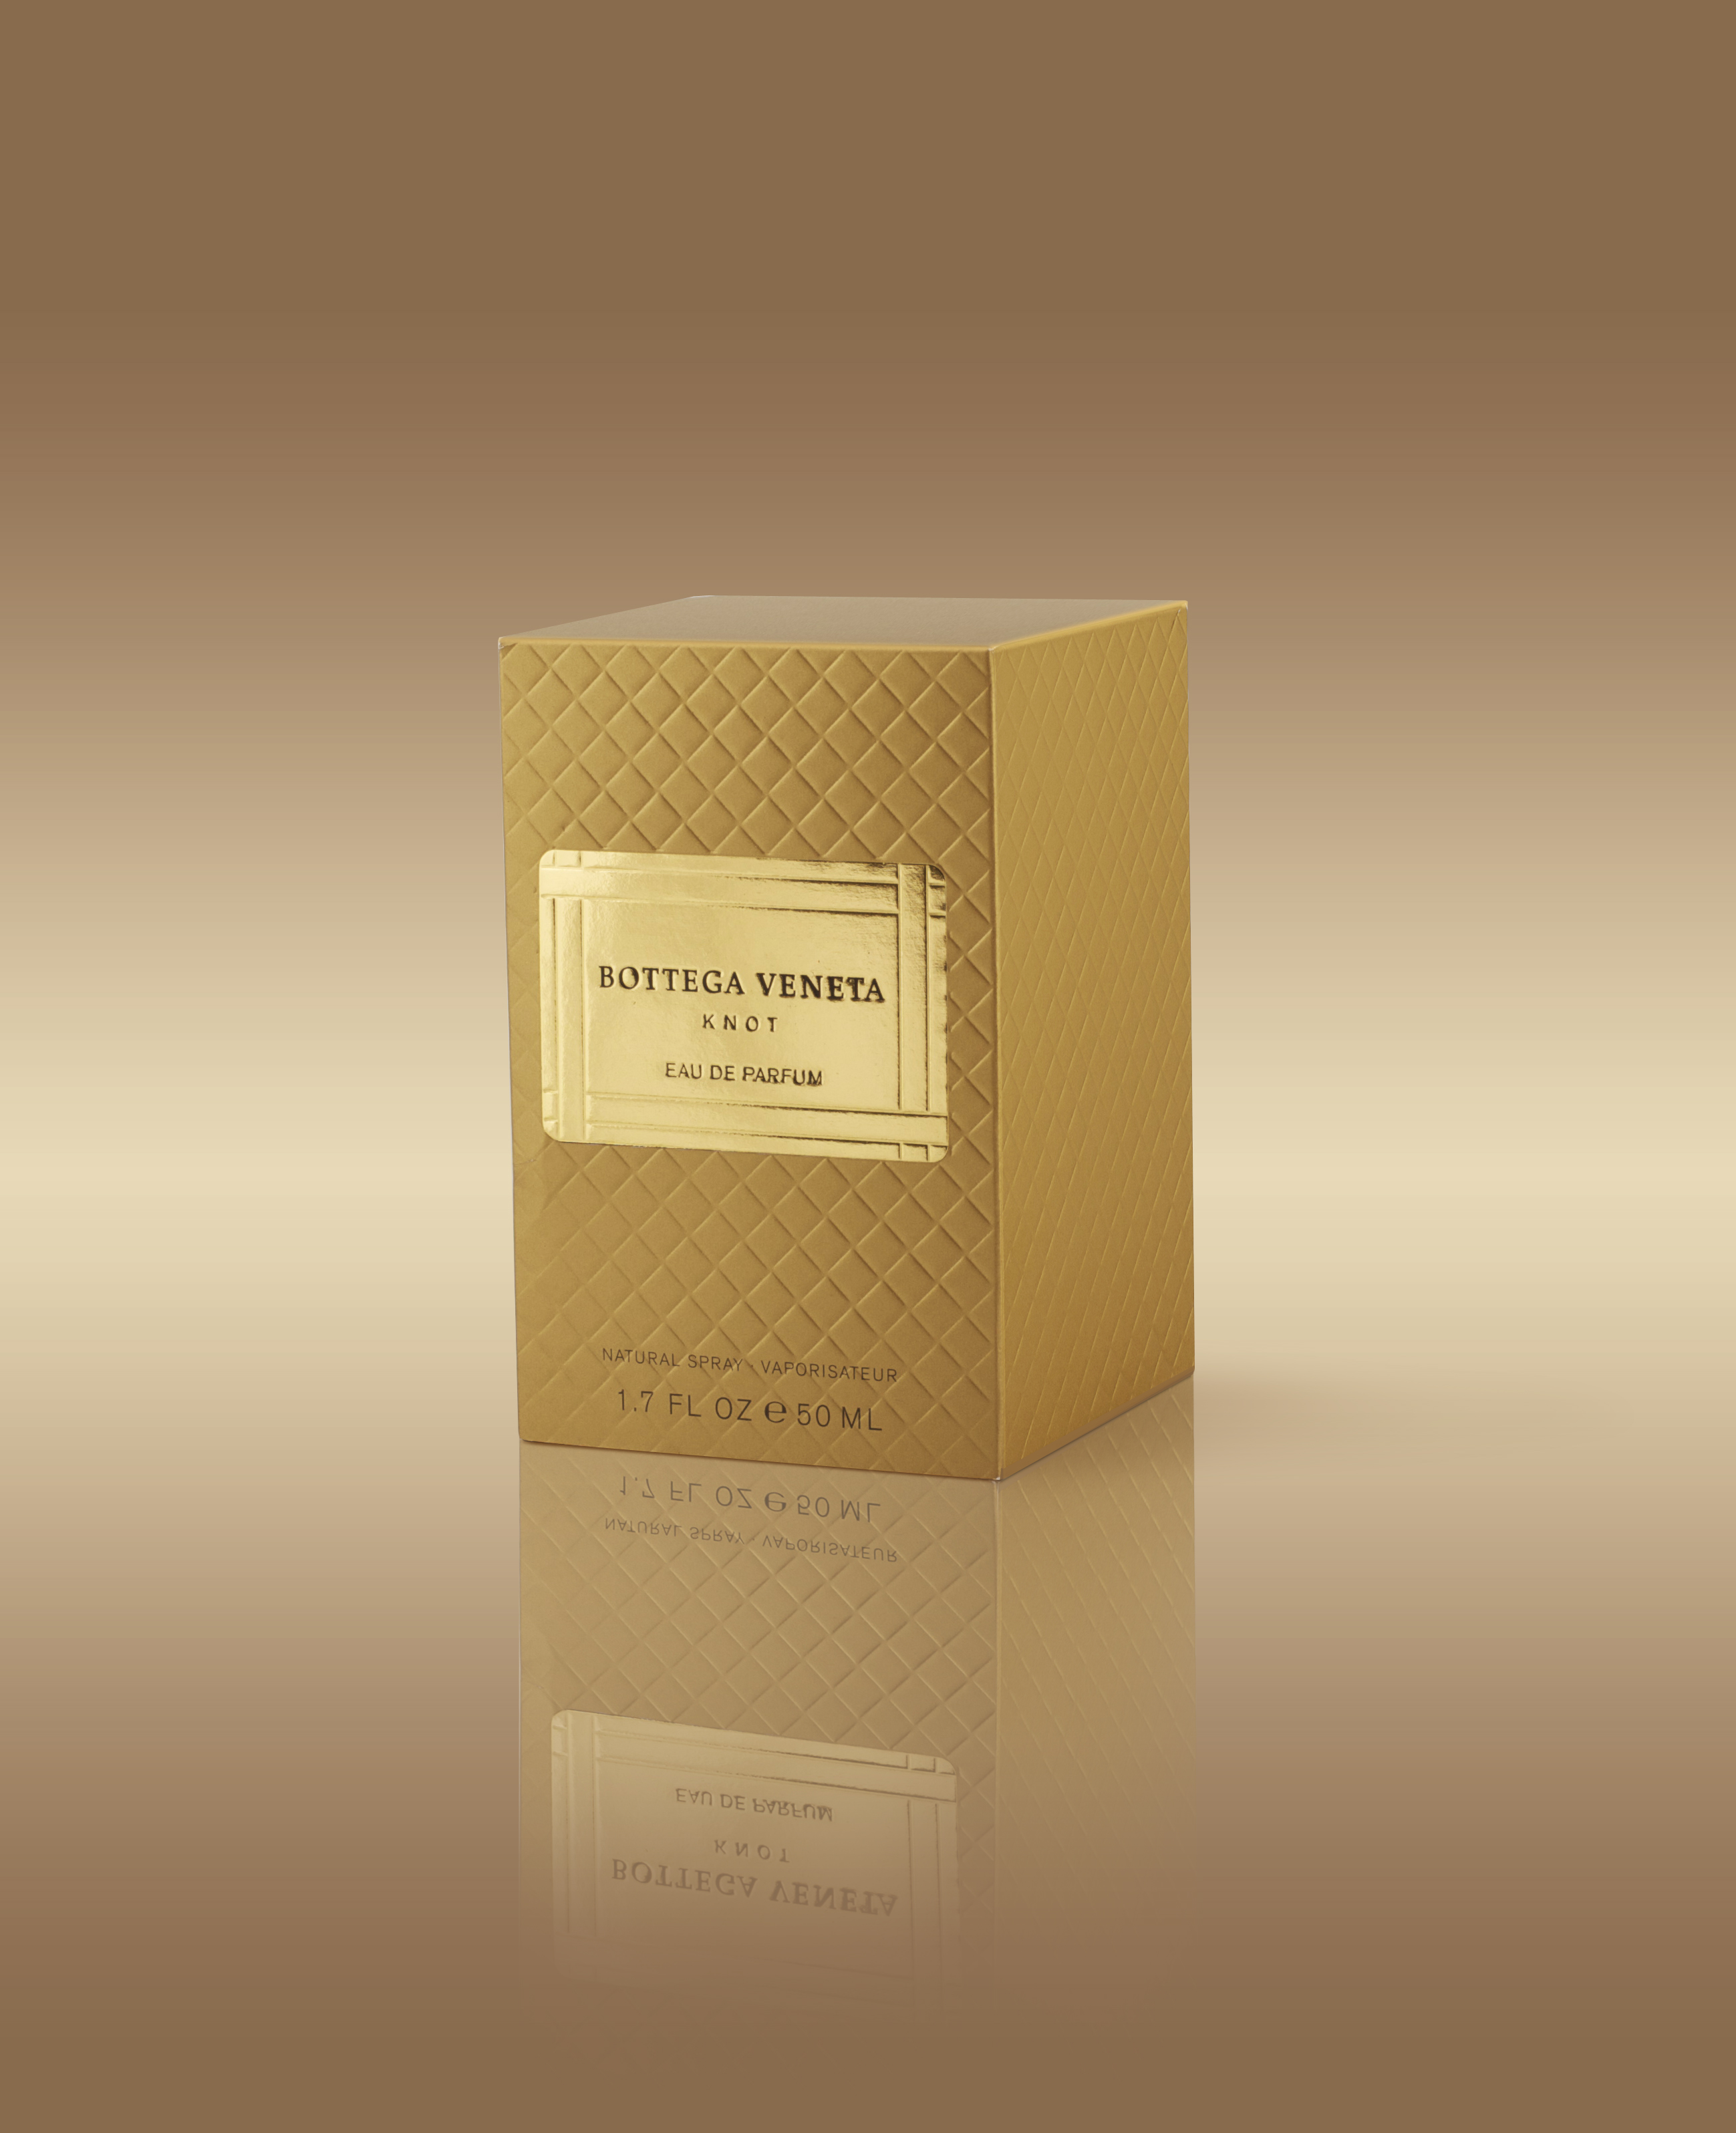 Botega parfum